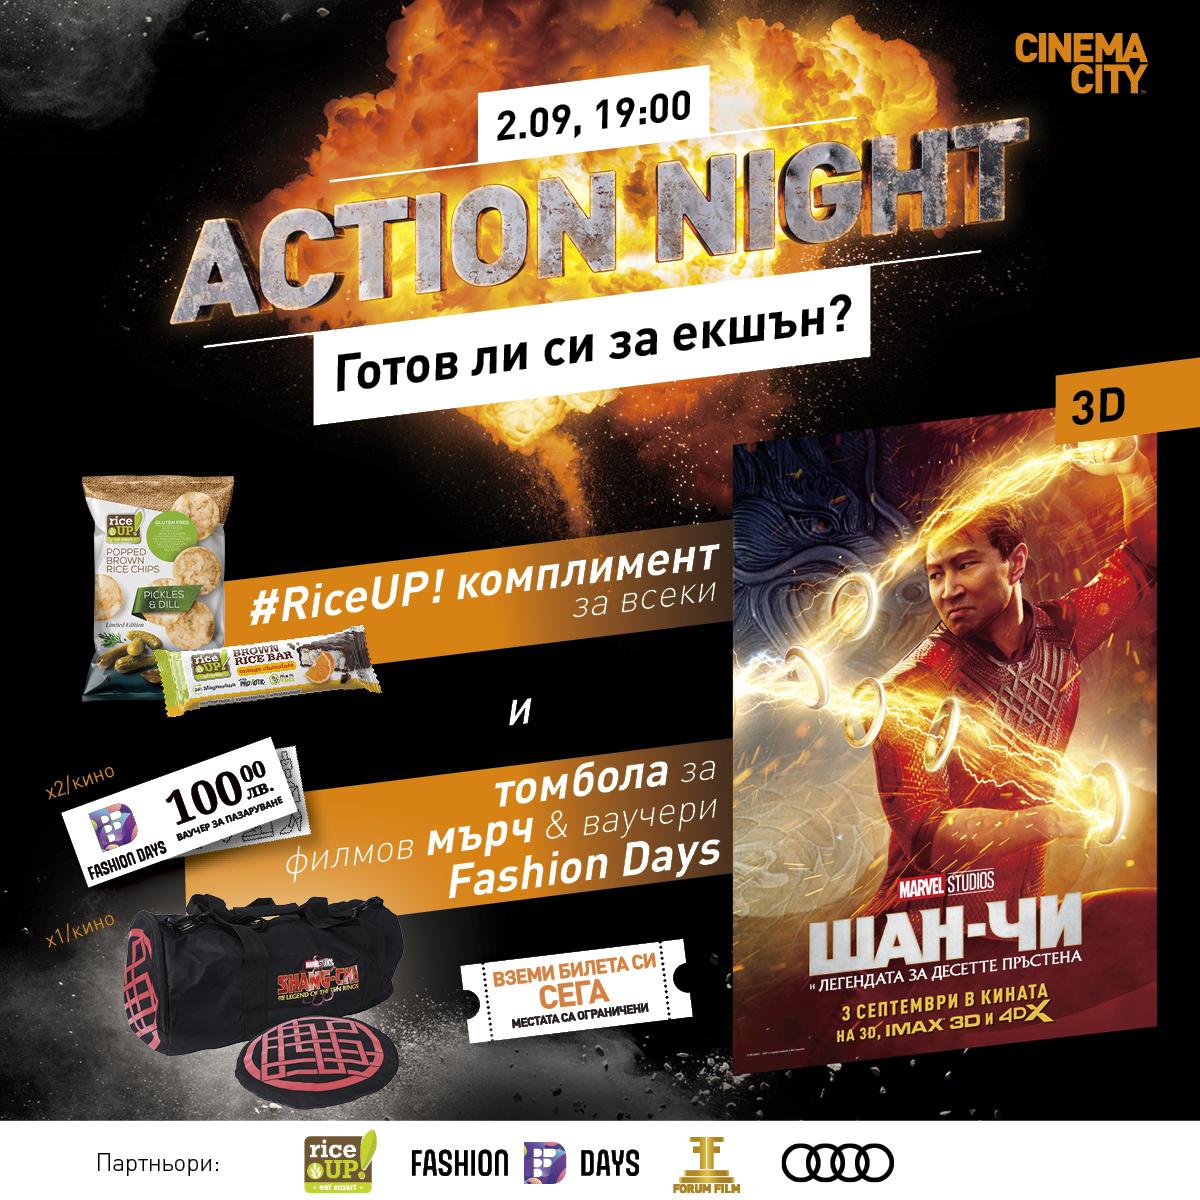 Action night с Шан Чи в Cinema City